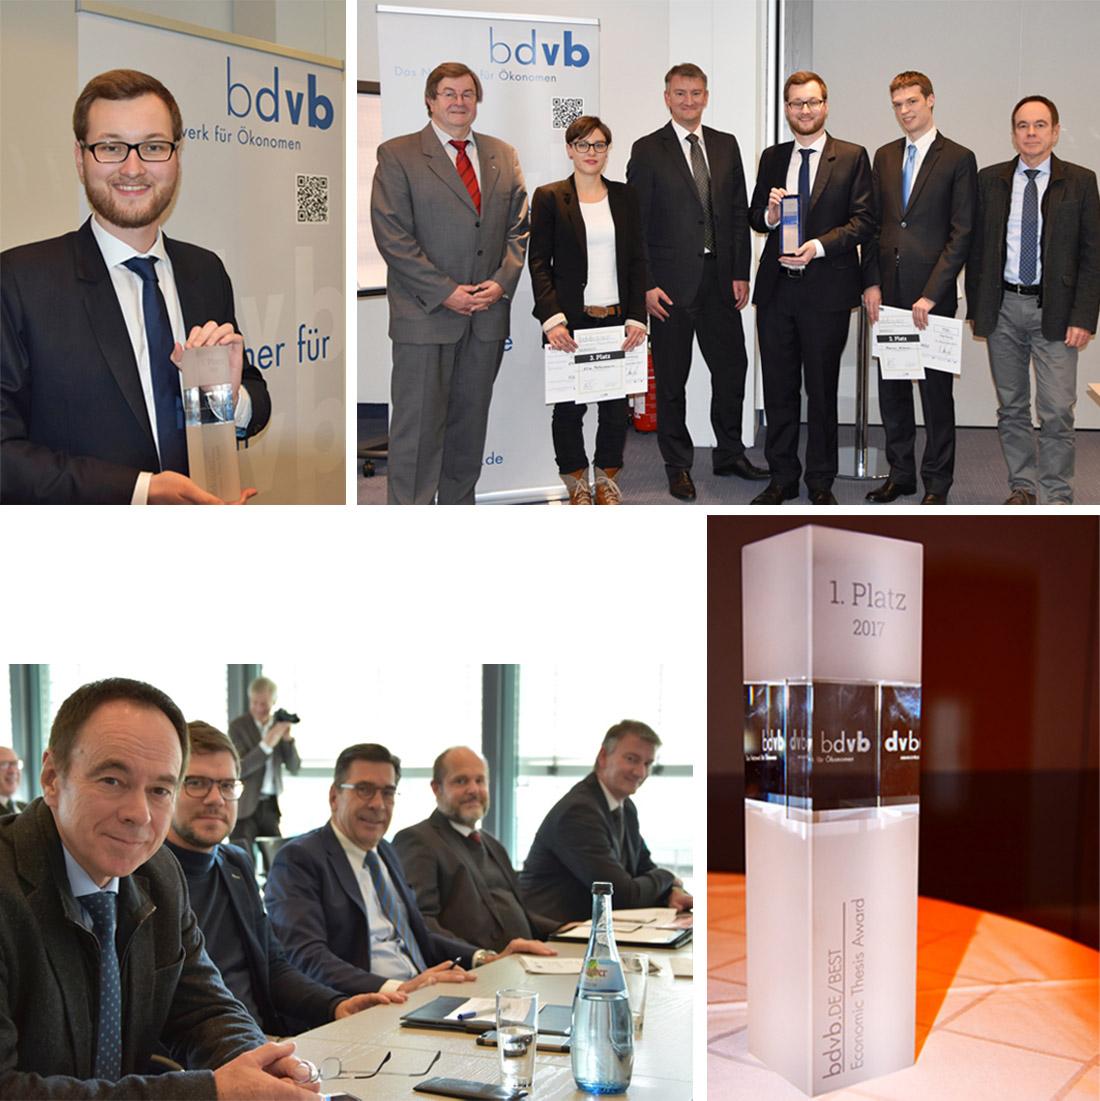 Verleihung bdvb BEST Economic Thesis Award, Collage, News